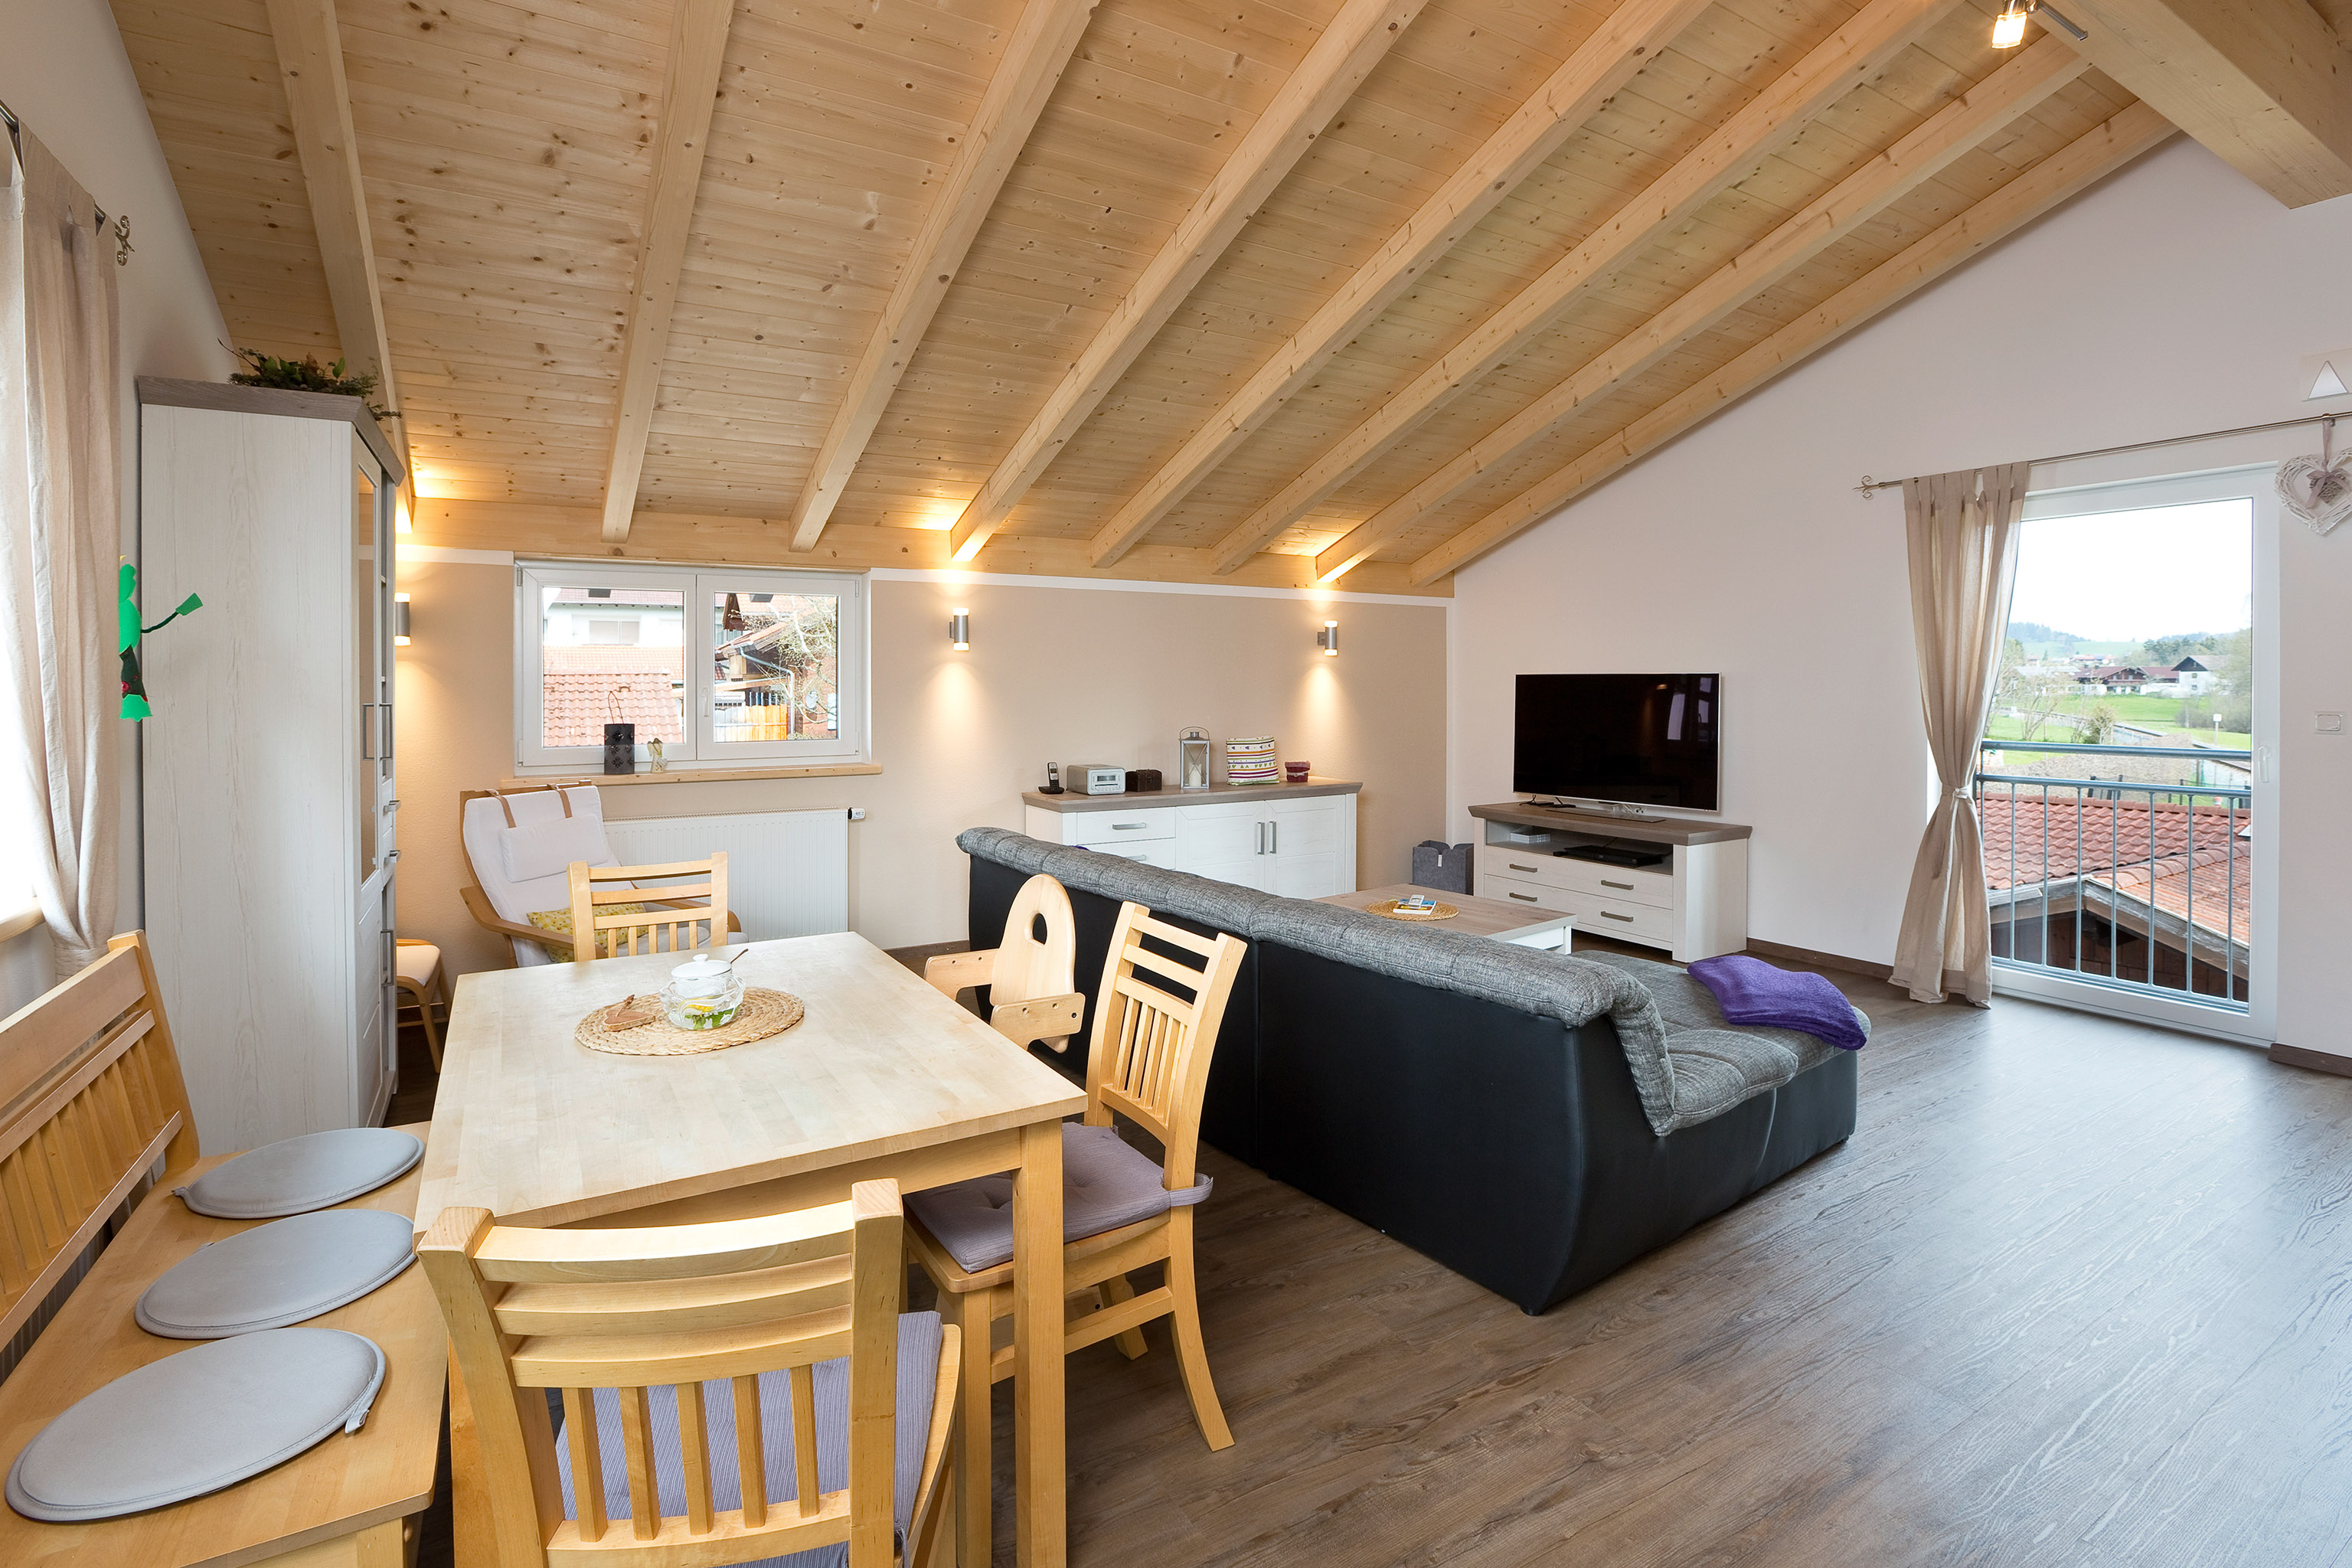 anbau mit anbau carport alu zum verkauf bersicht zum. Black Bedroom Furniture Sets. Home Design Ideas